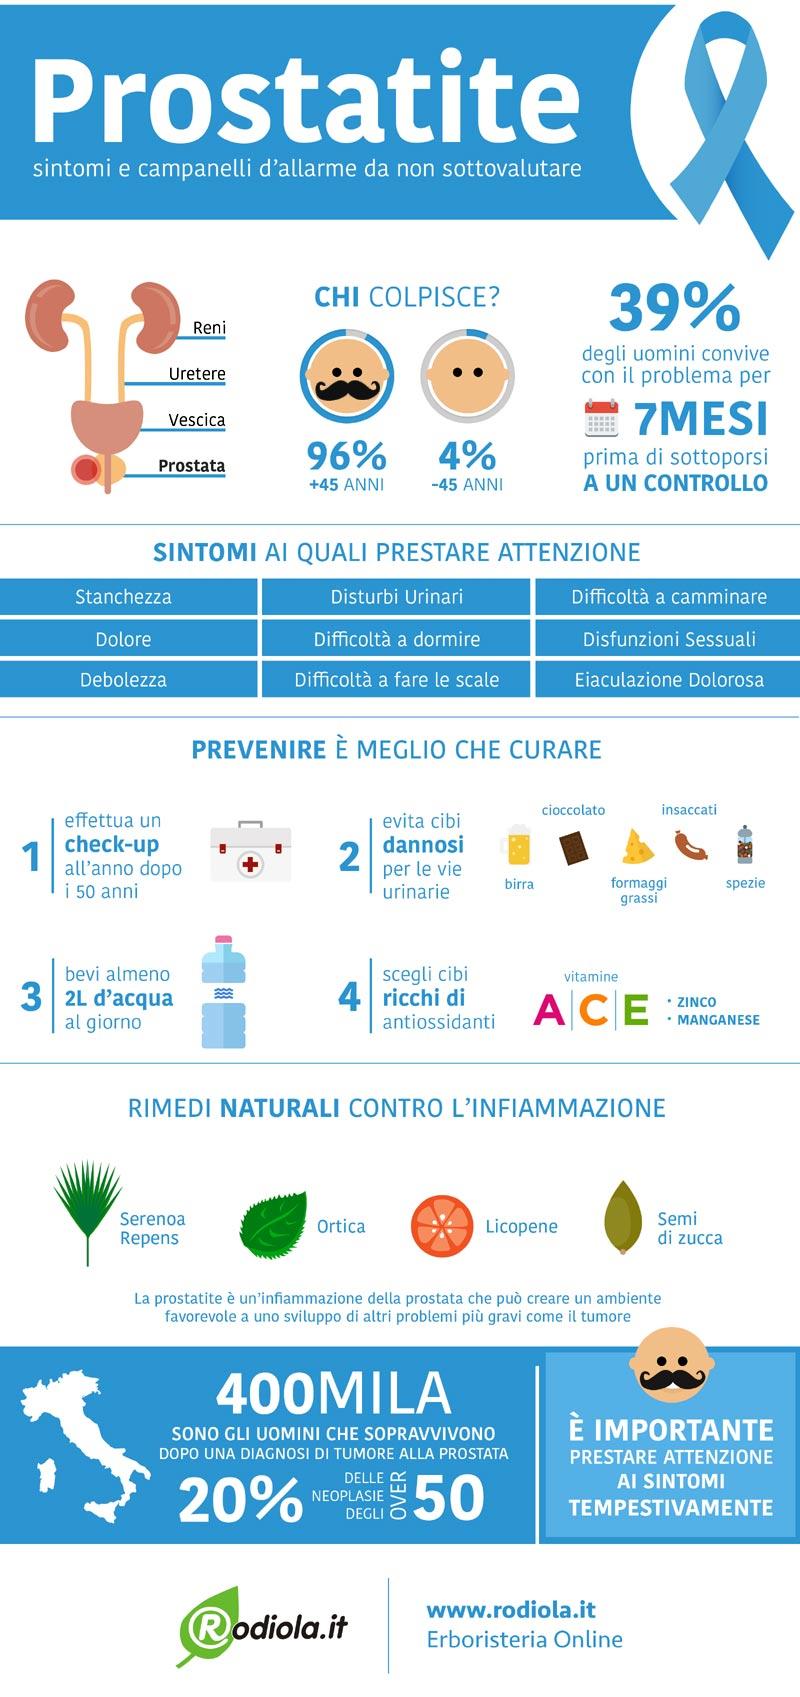 Prostatite: cause, cure e sintomi - Infografica